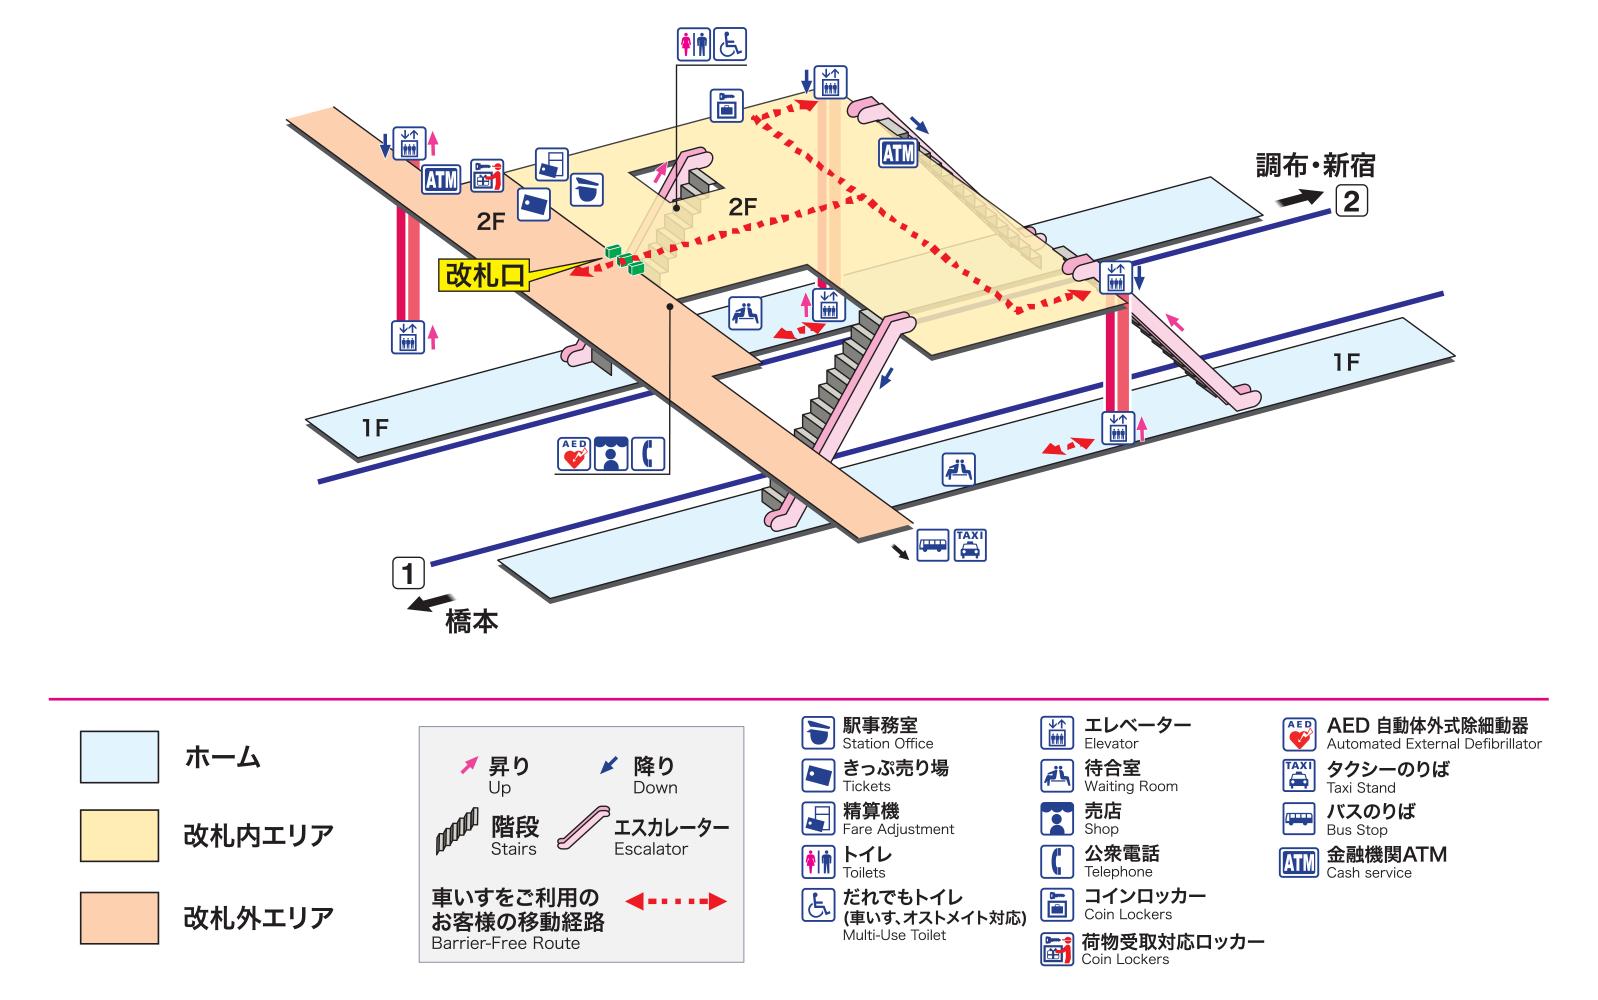 https://www.keio.co.jp/train/station/ko43_minami-osawa/images/station_map.png